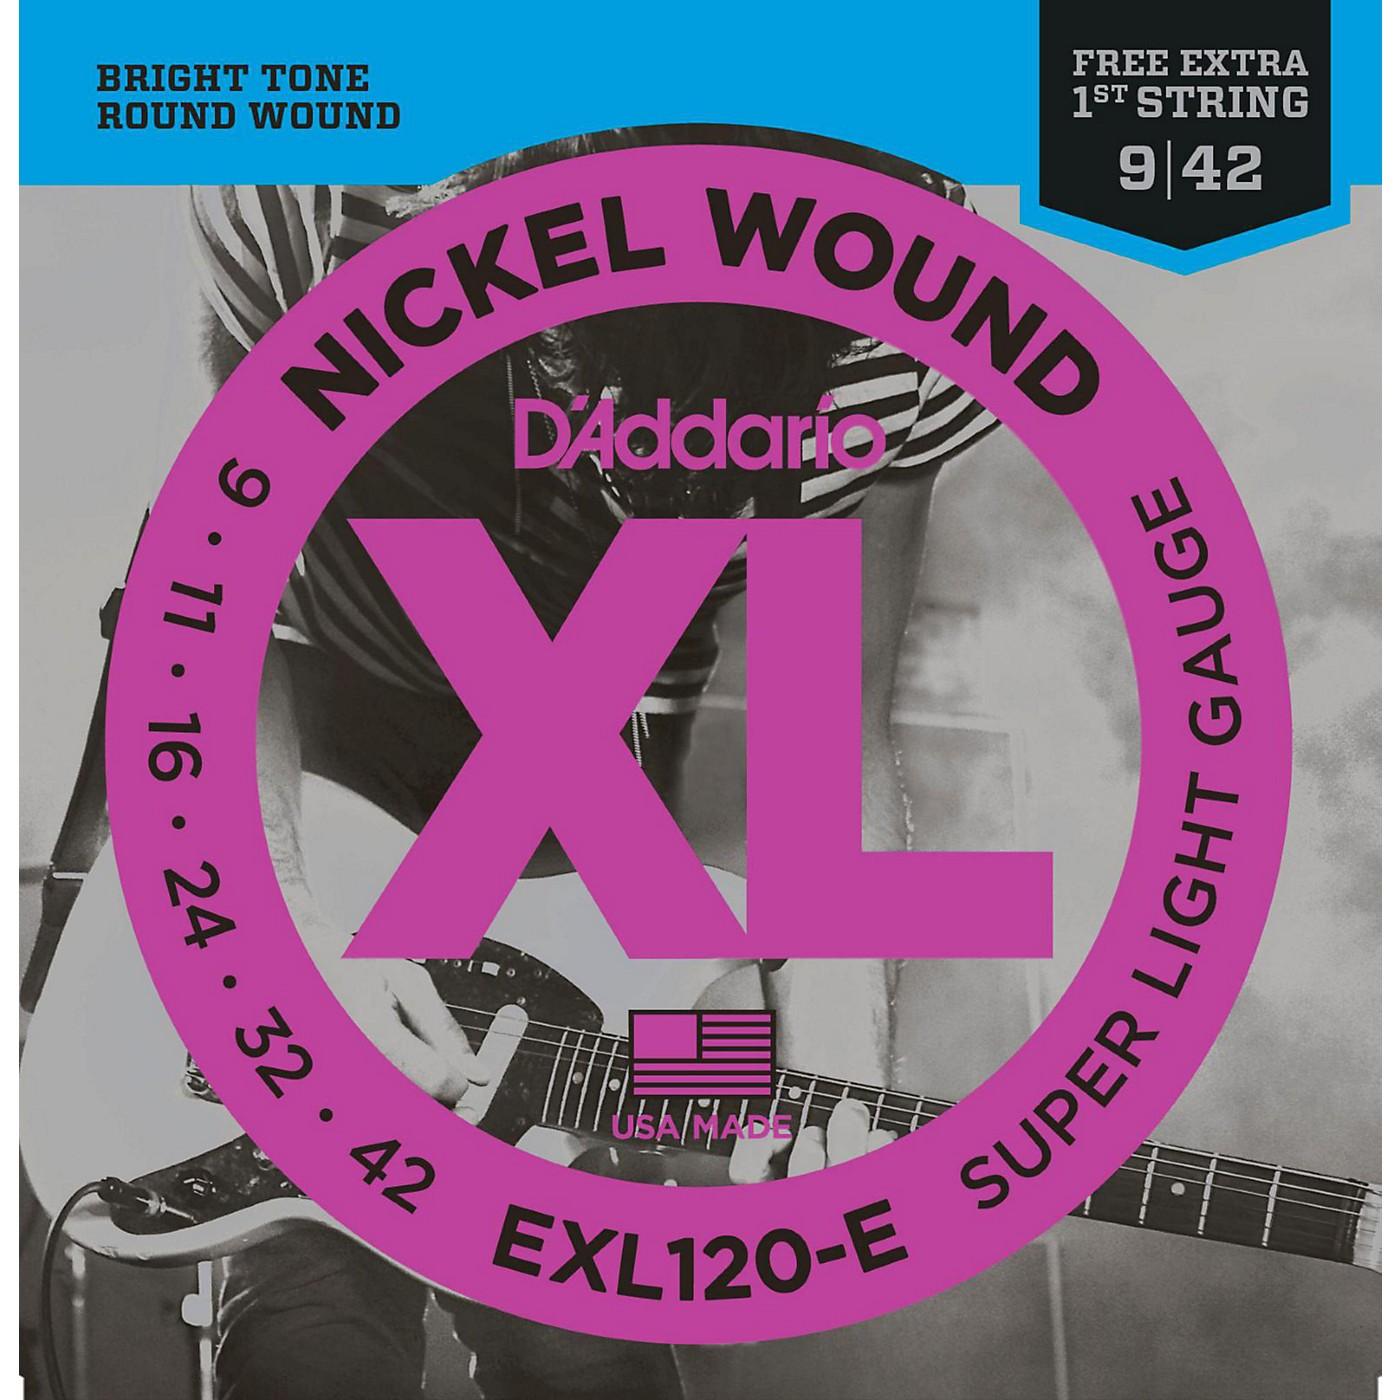 D'Addario EXL120-E Bonus Pack: Super Light Electric Guitar Strings with Bonus High E String (9-42) thumbnail